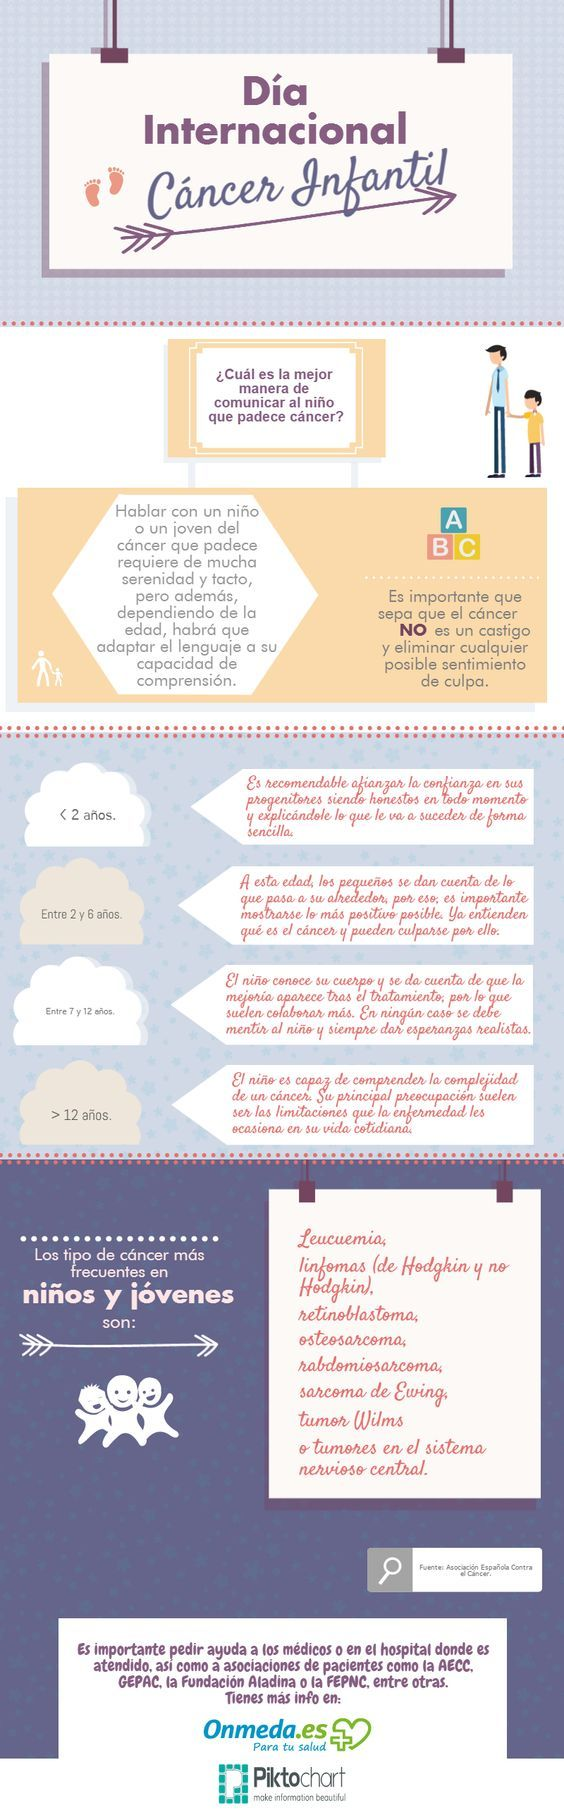 DiaMundialCáncerConsejosEnfrentarloNiños-Infografía-BlogGesvin